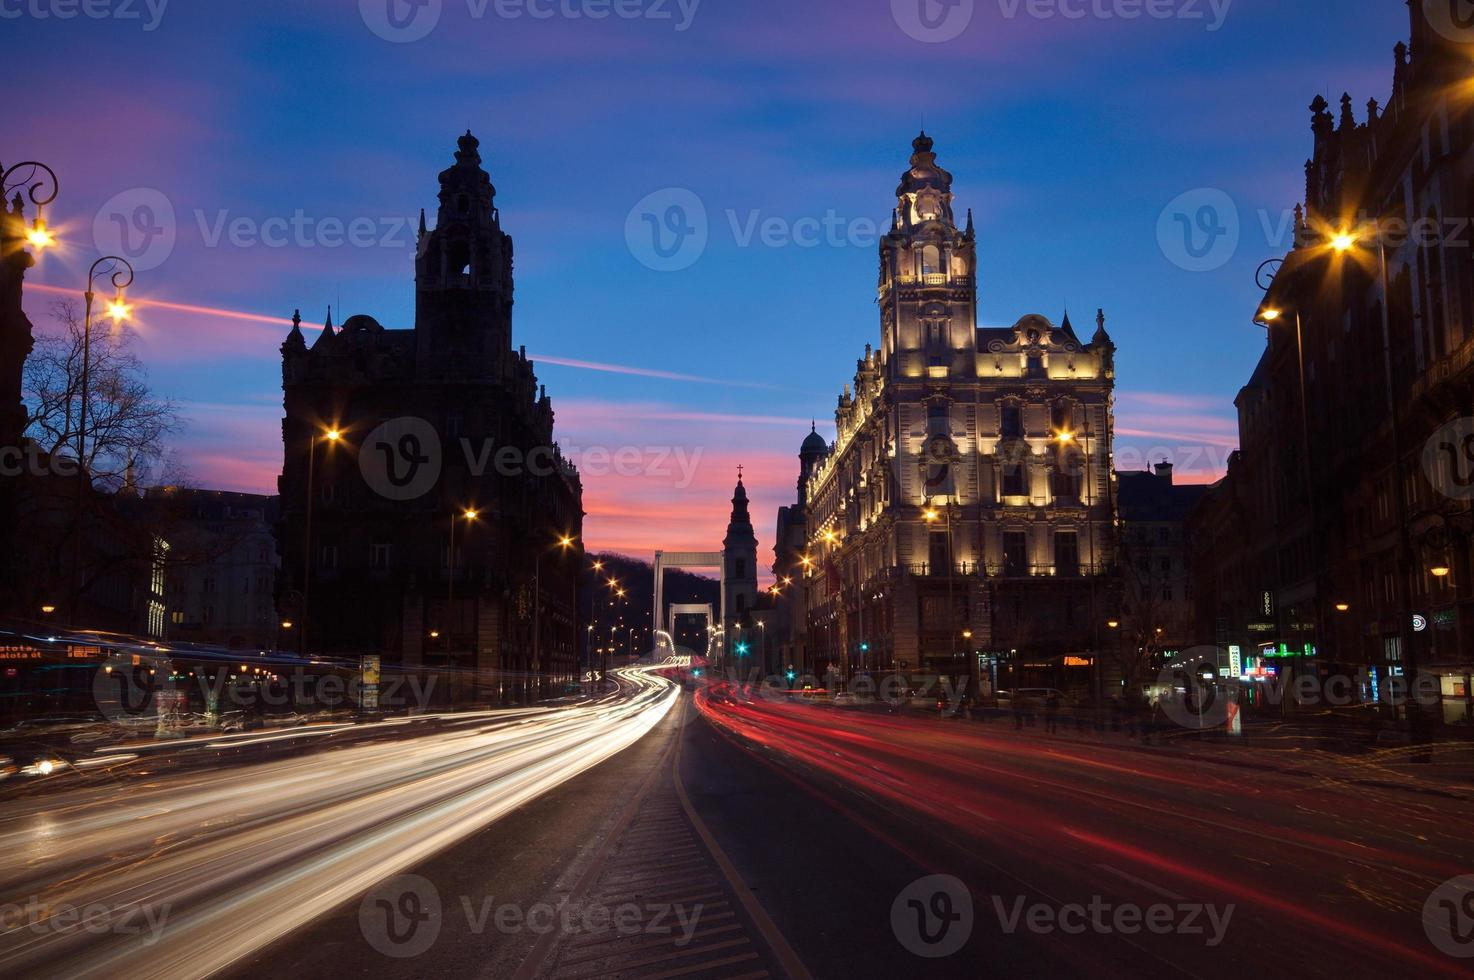 traffico notturno a budapest foto